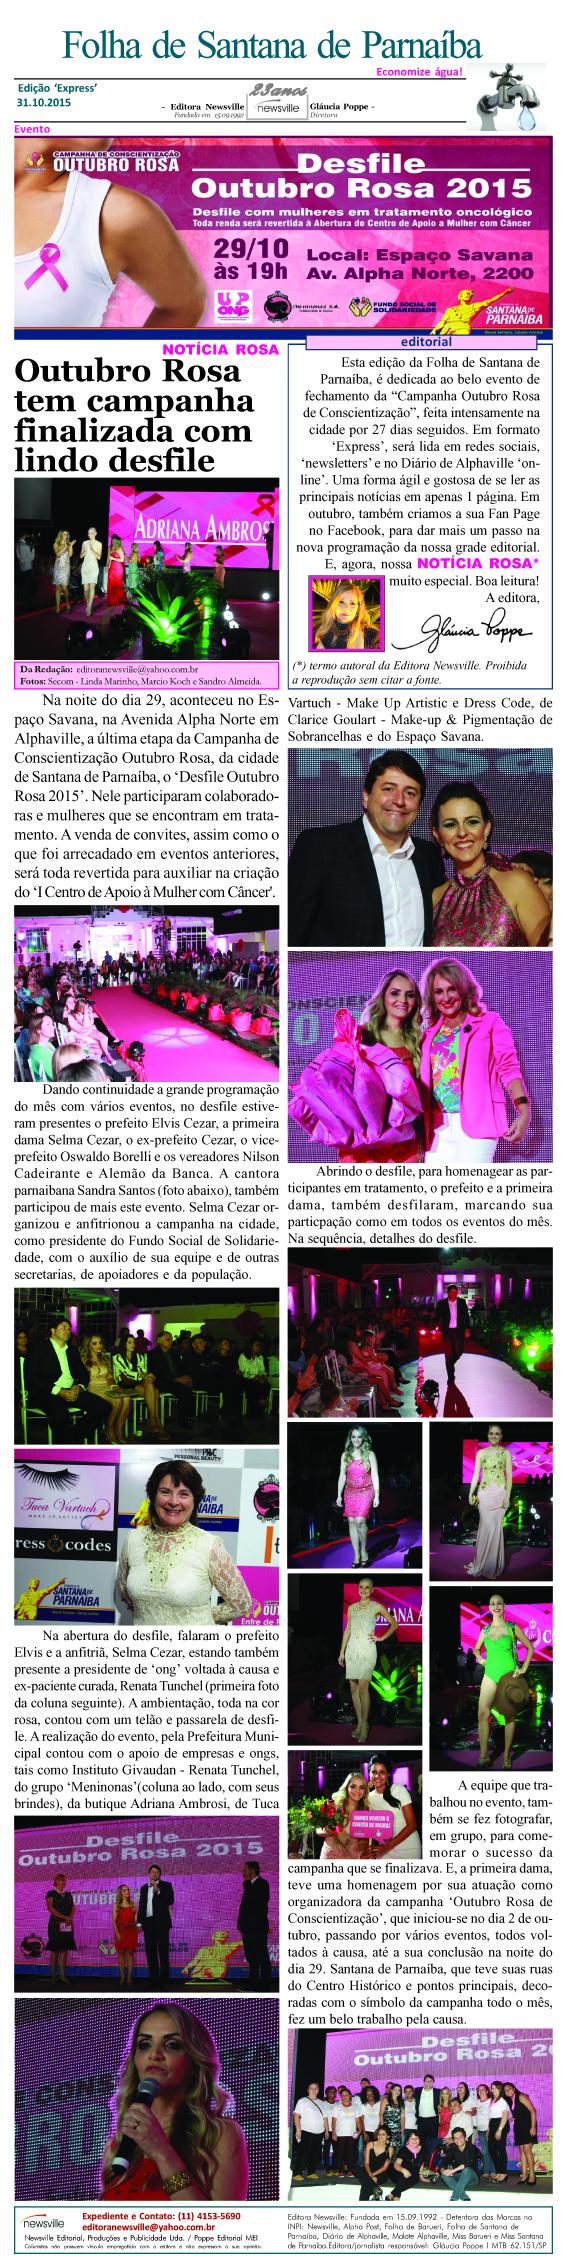 folha-sant-parn-expr-31.10.15 copy